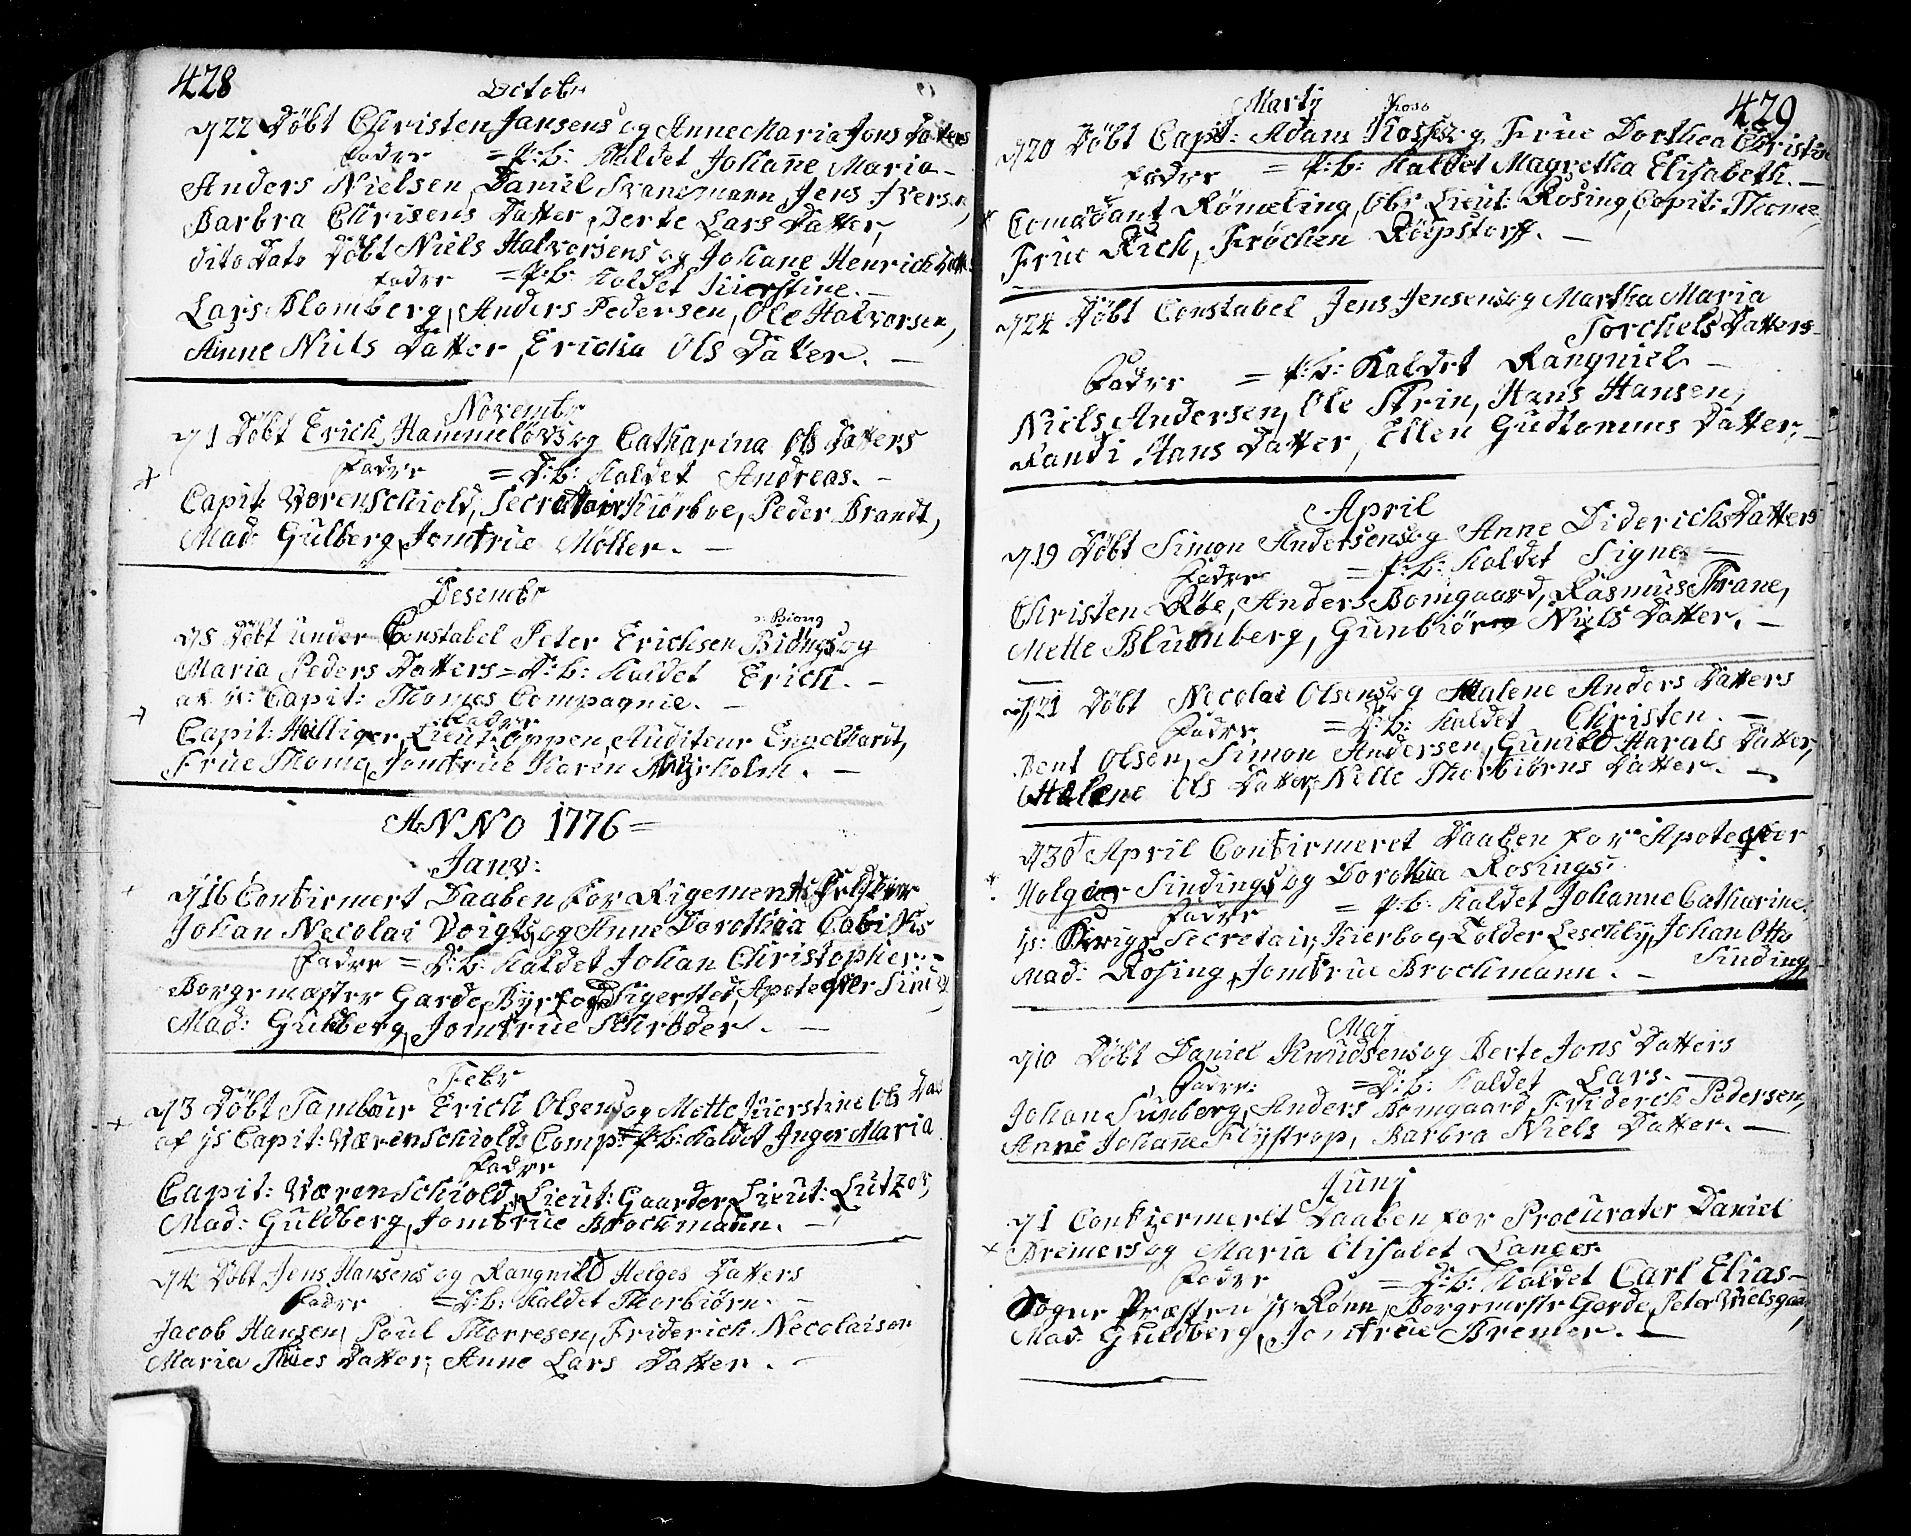 SAO, Fredrikstad prestekontor Kirkebøker, F/Fa/L0002: Ministerialbok nr. 2, 1750-1804, s. 428-429